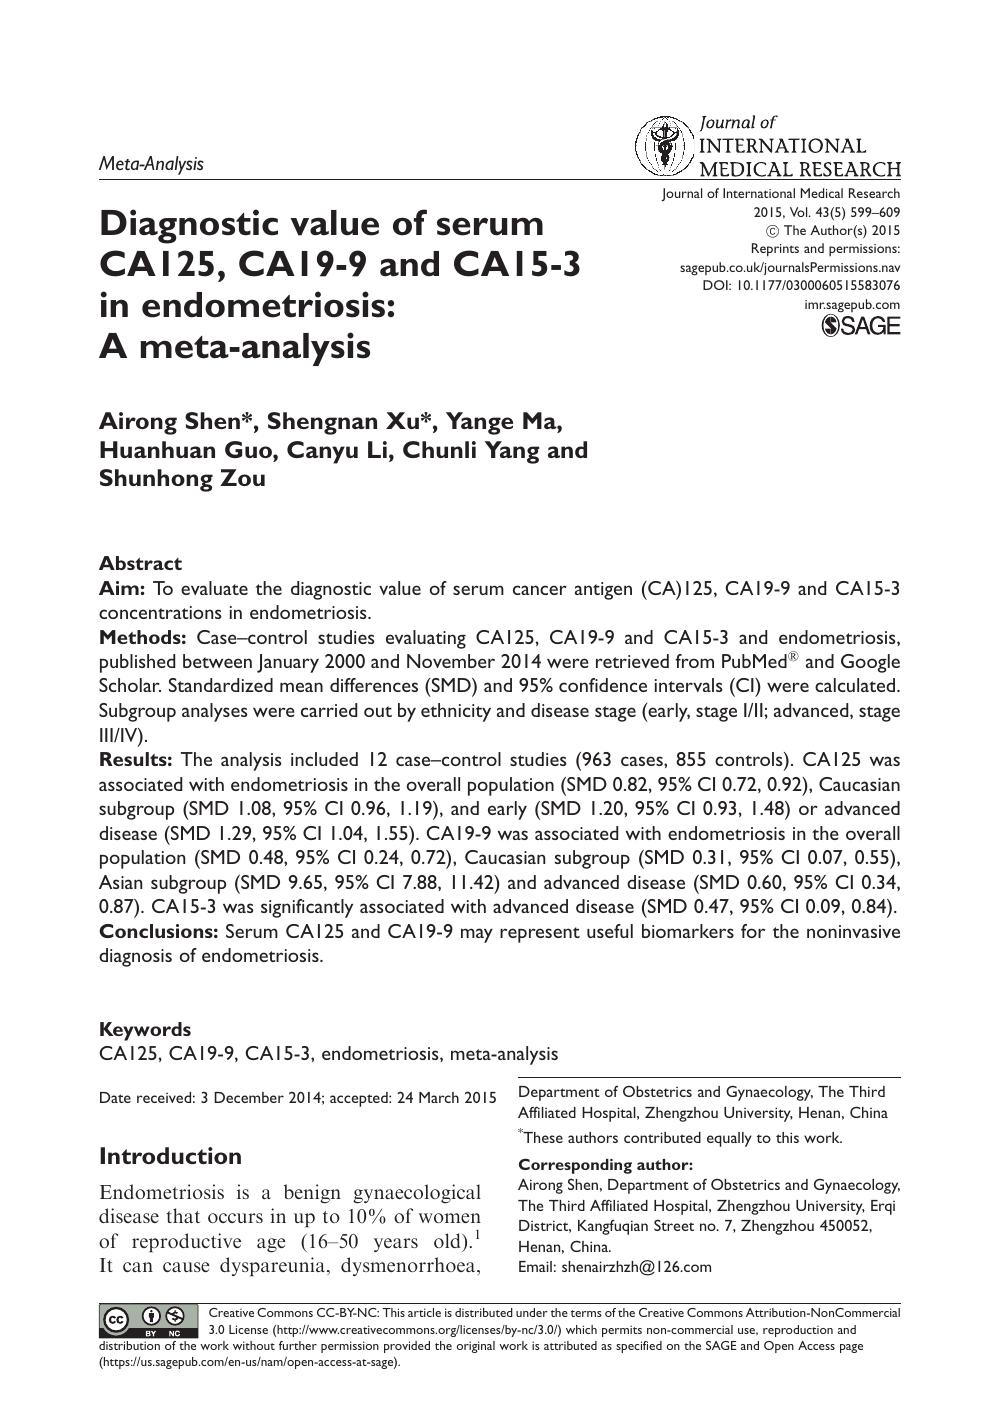 Diagnostic value of serum CA125, CA19-9 and CA15-3 in